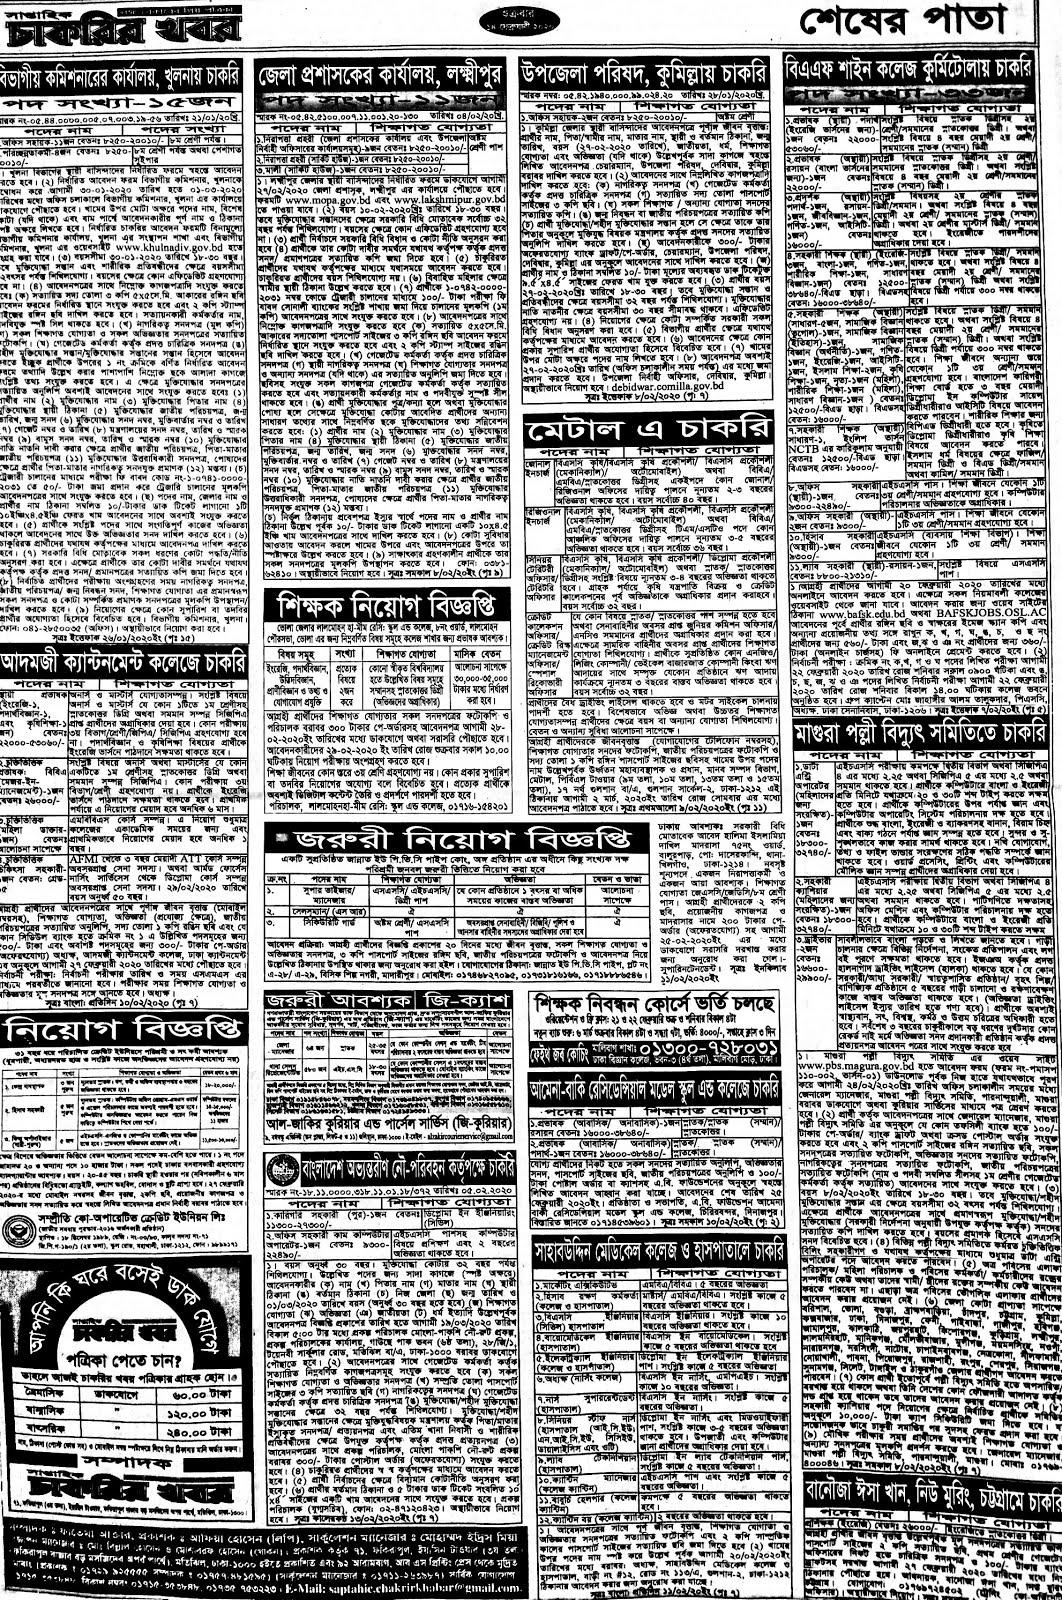 Saptahik Chakrir Khobor Newspaper 14 February 2020 সাপ্তাহিক চাকরির খবর পত্রিকা pdf Download